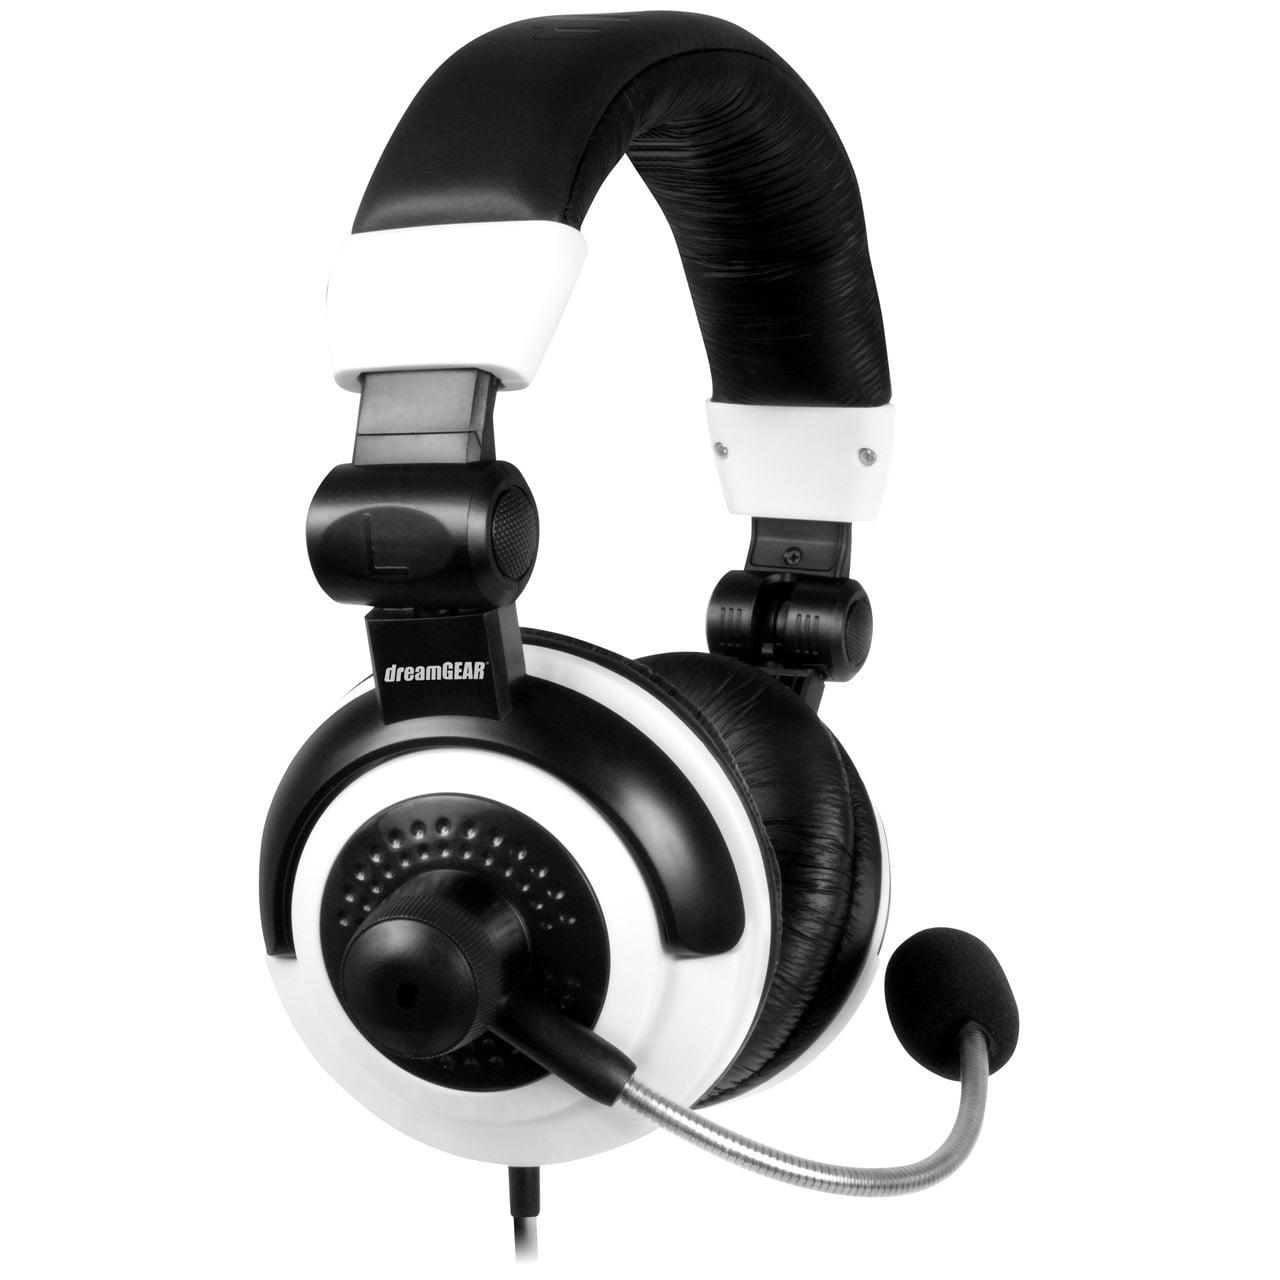 DreamGear  360 Elite Gaming Headset